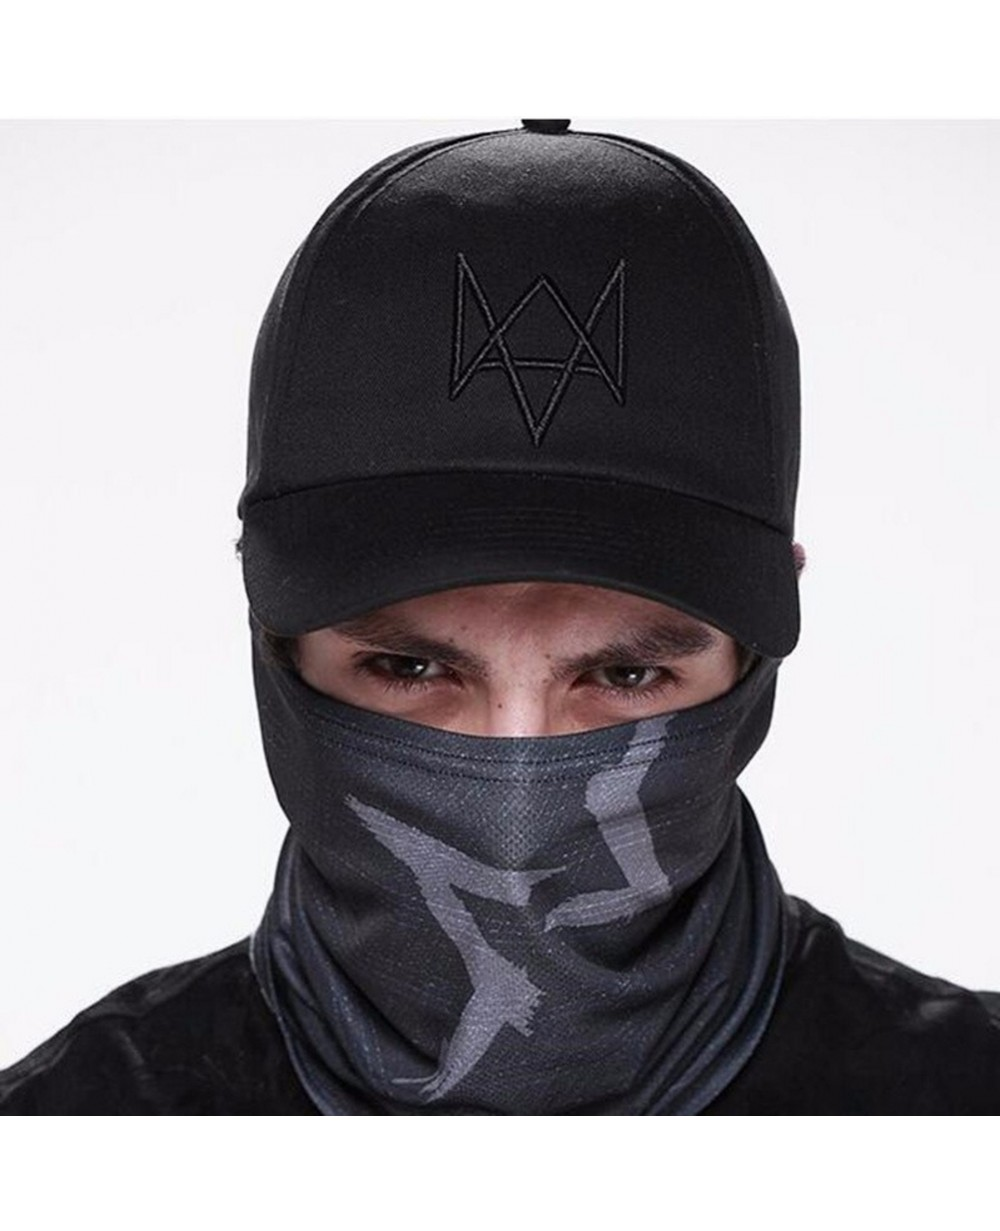 Aiden Pearce Black Half Face Mask Version 2